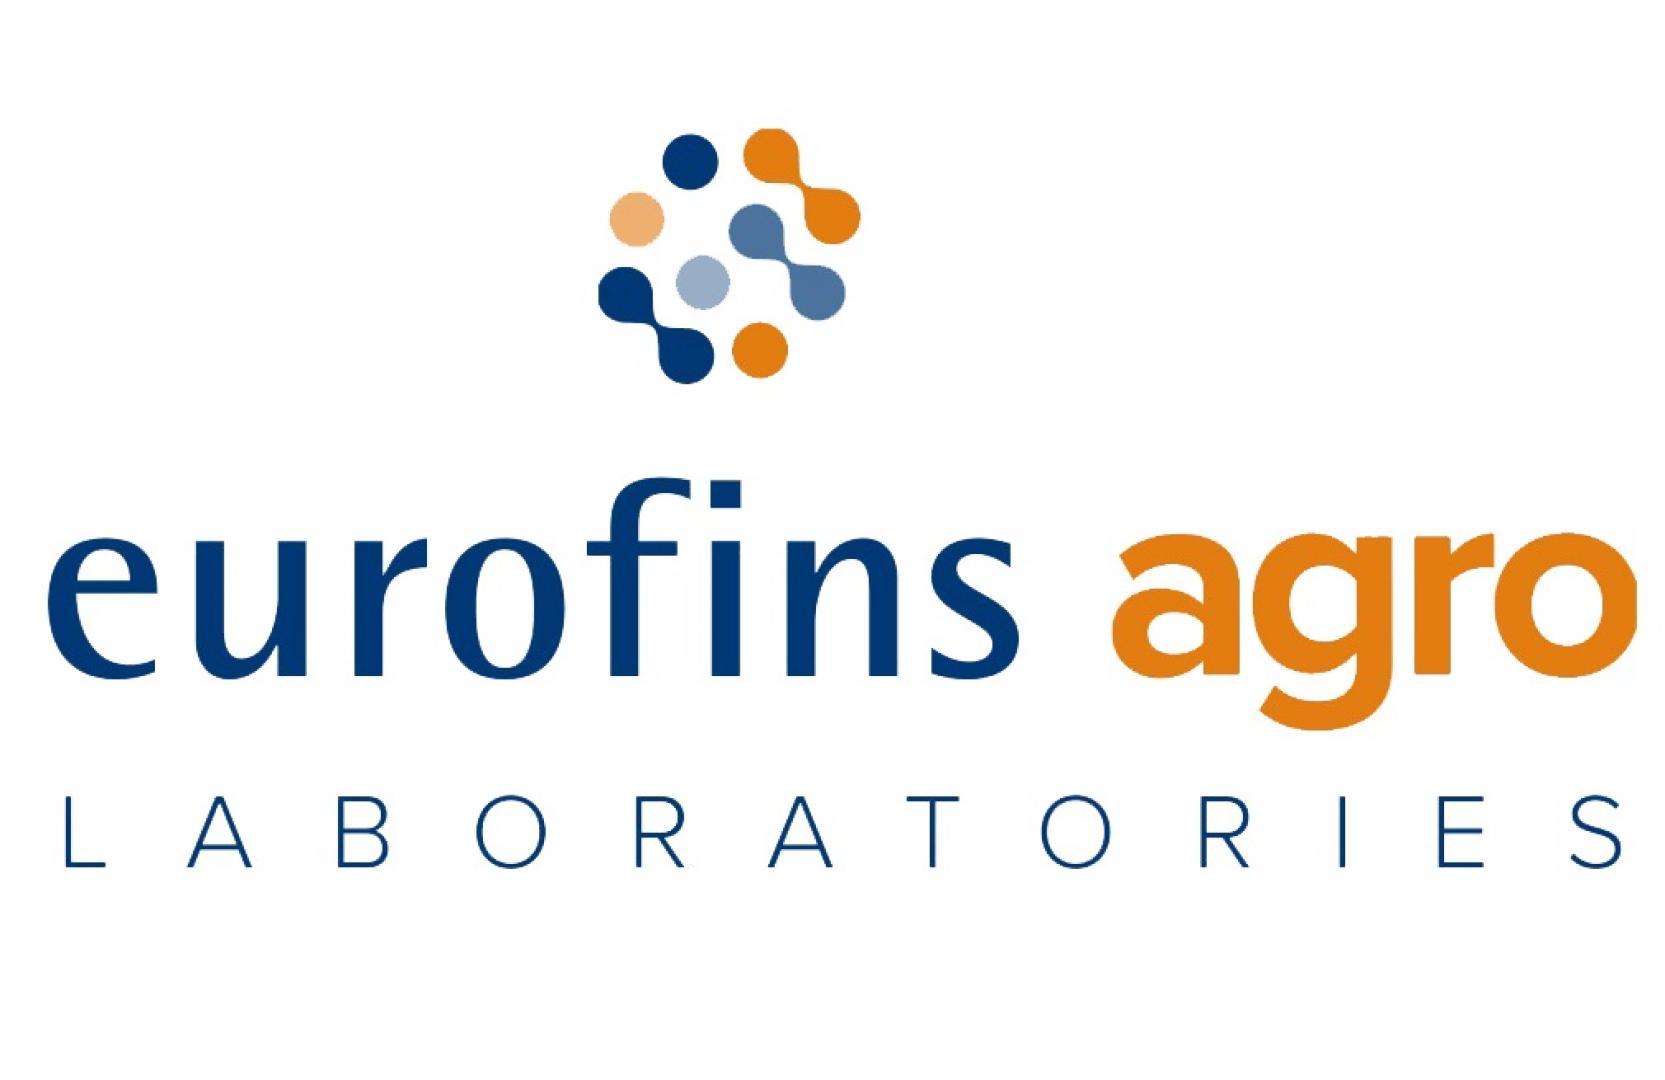 Mest-app Eurofins verder uitgebreid